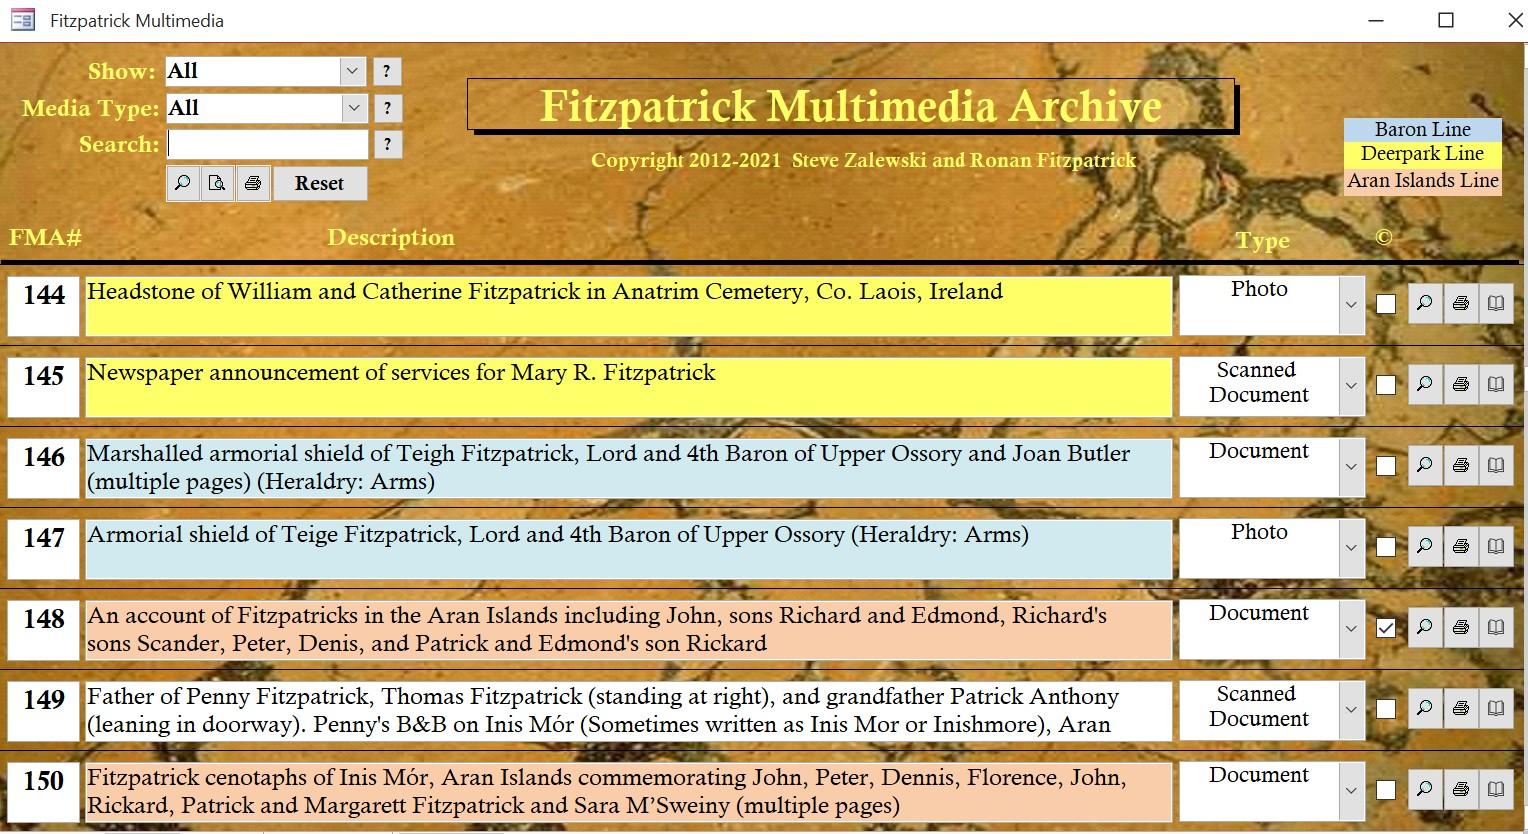 Fitzpatrick Multimedia Archive